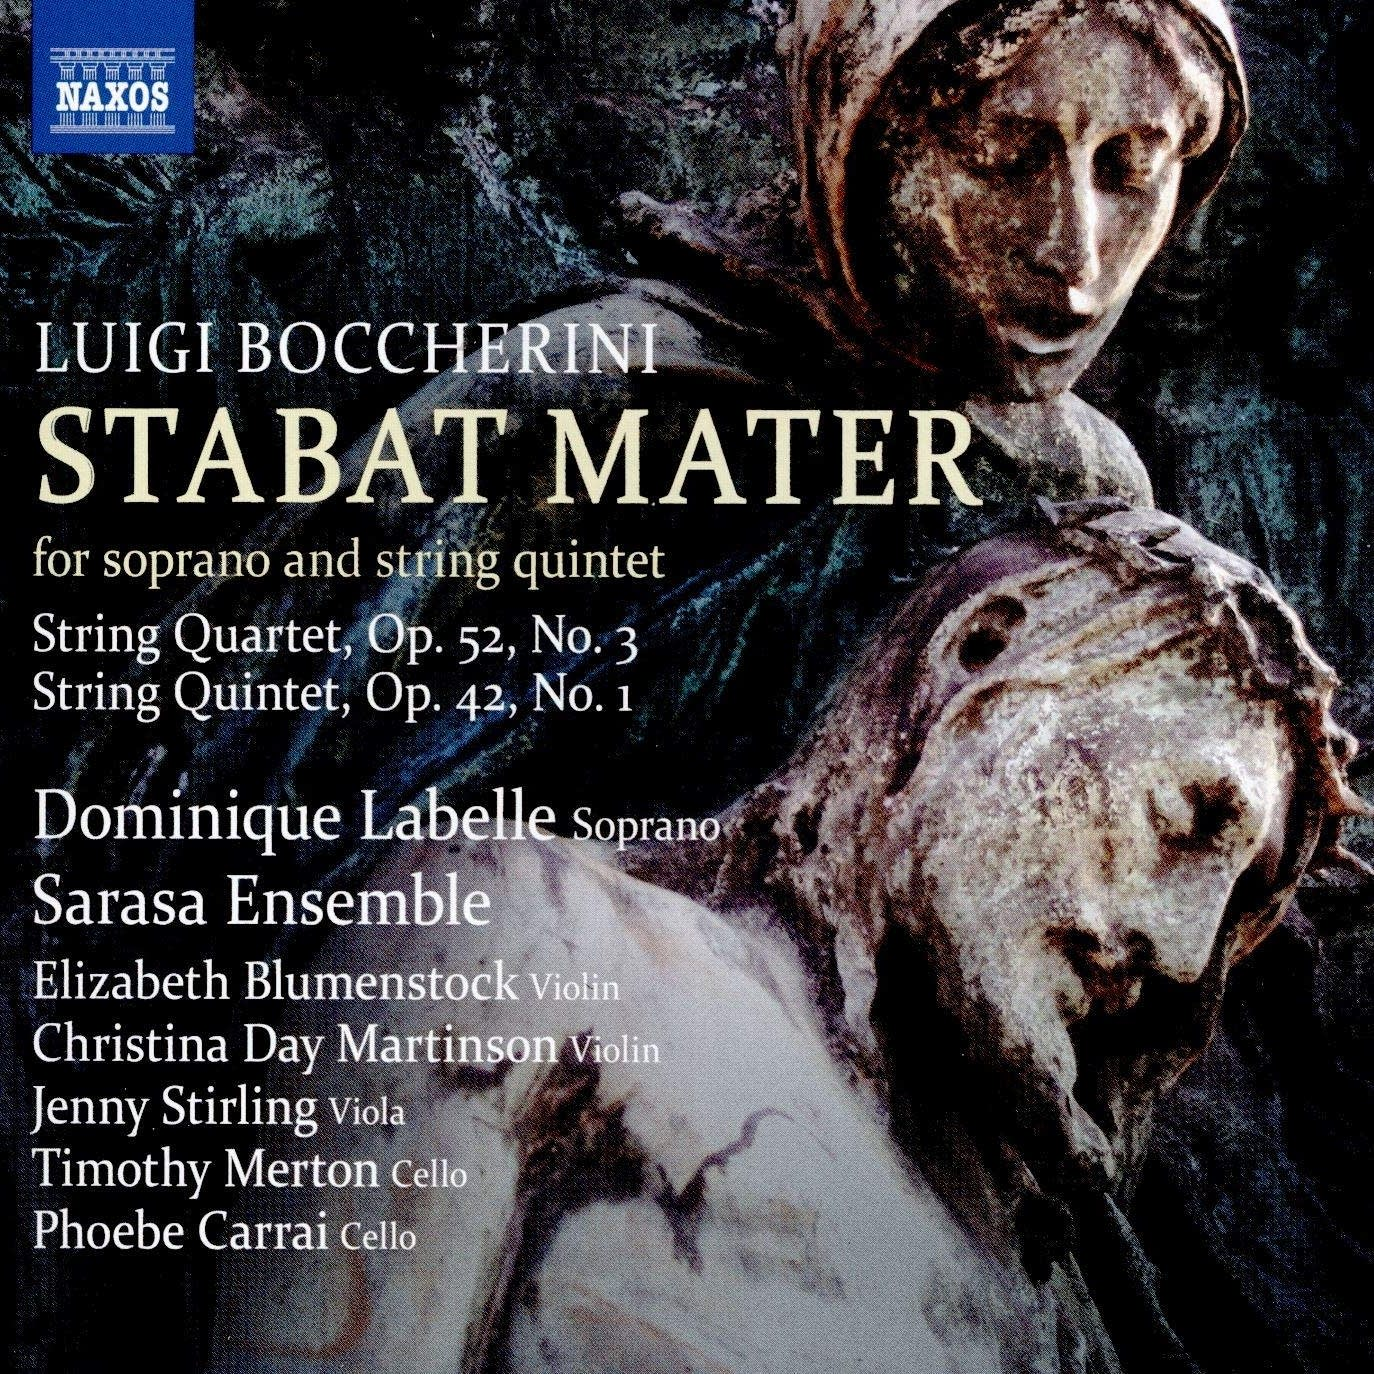 Luigi Boccherini - String Quartet in G: IV. Allegro giusto